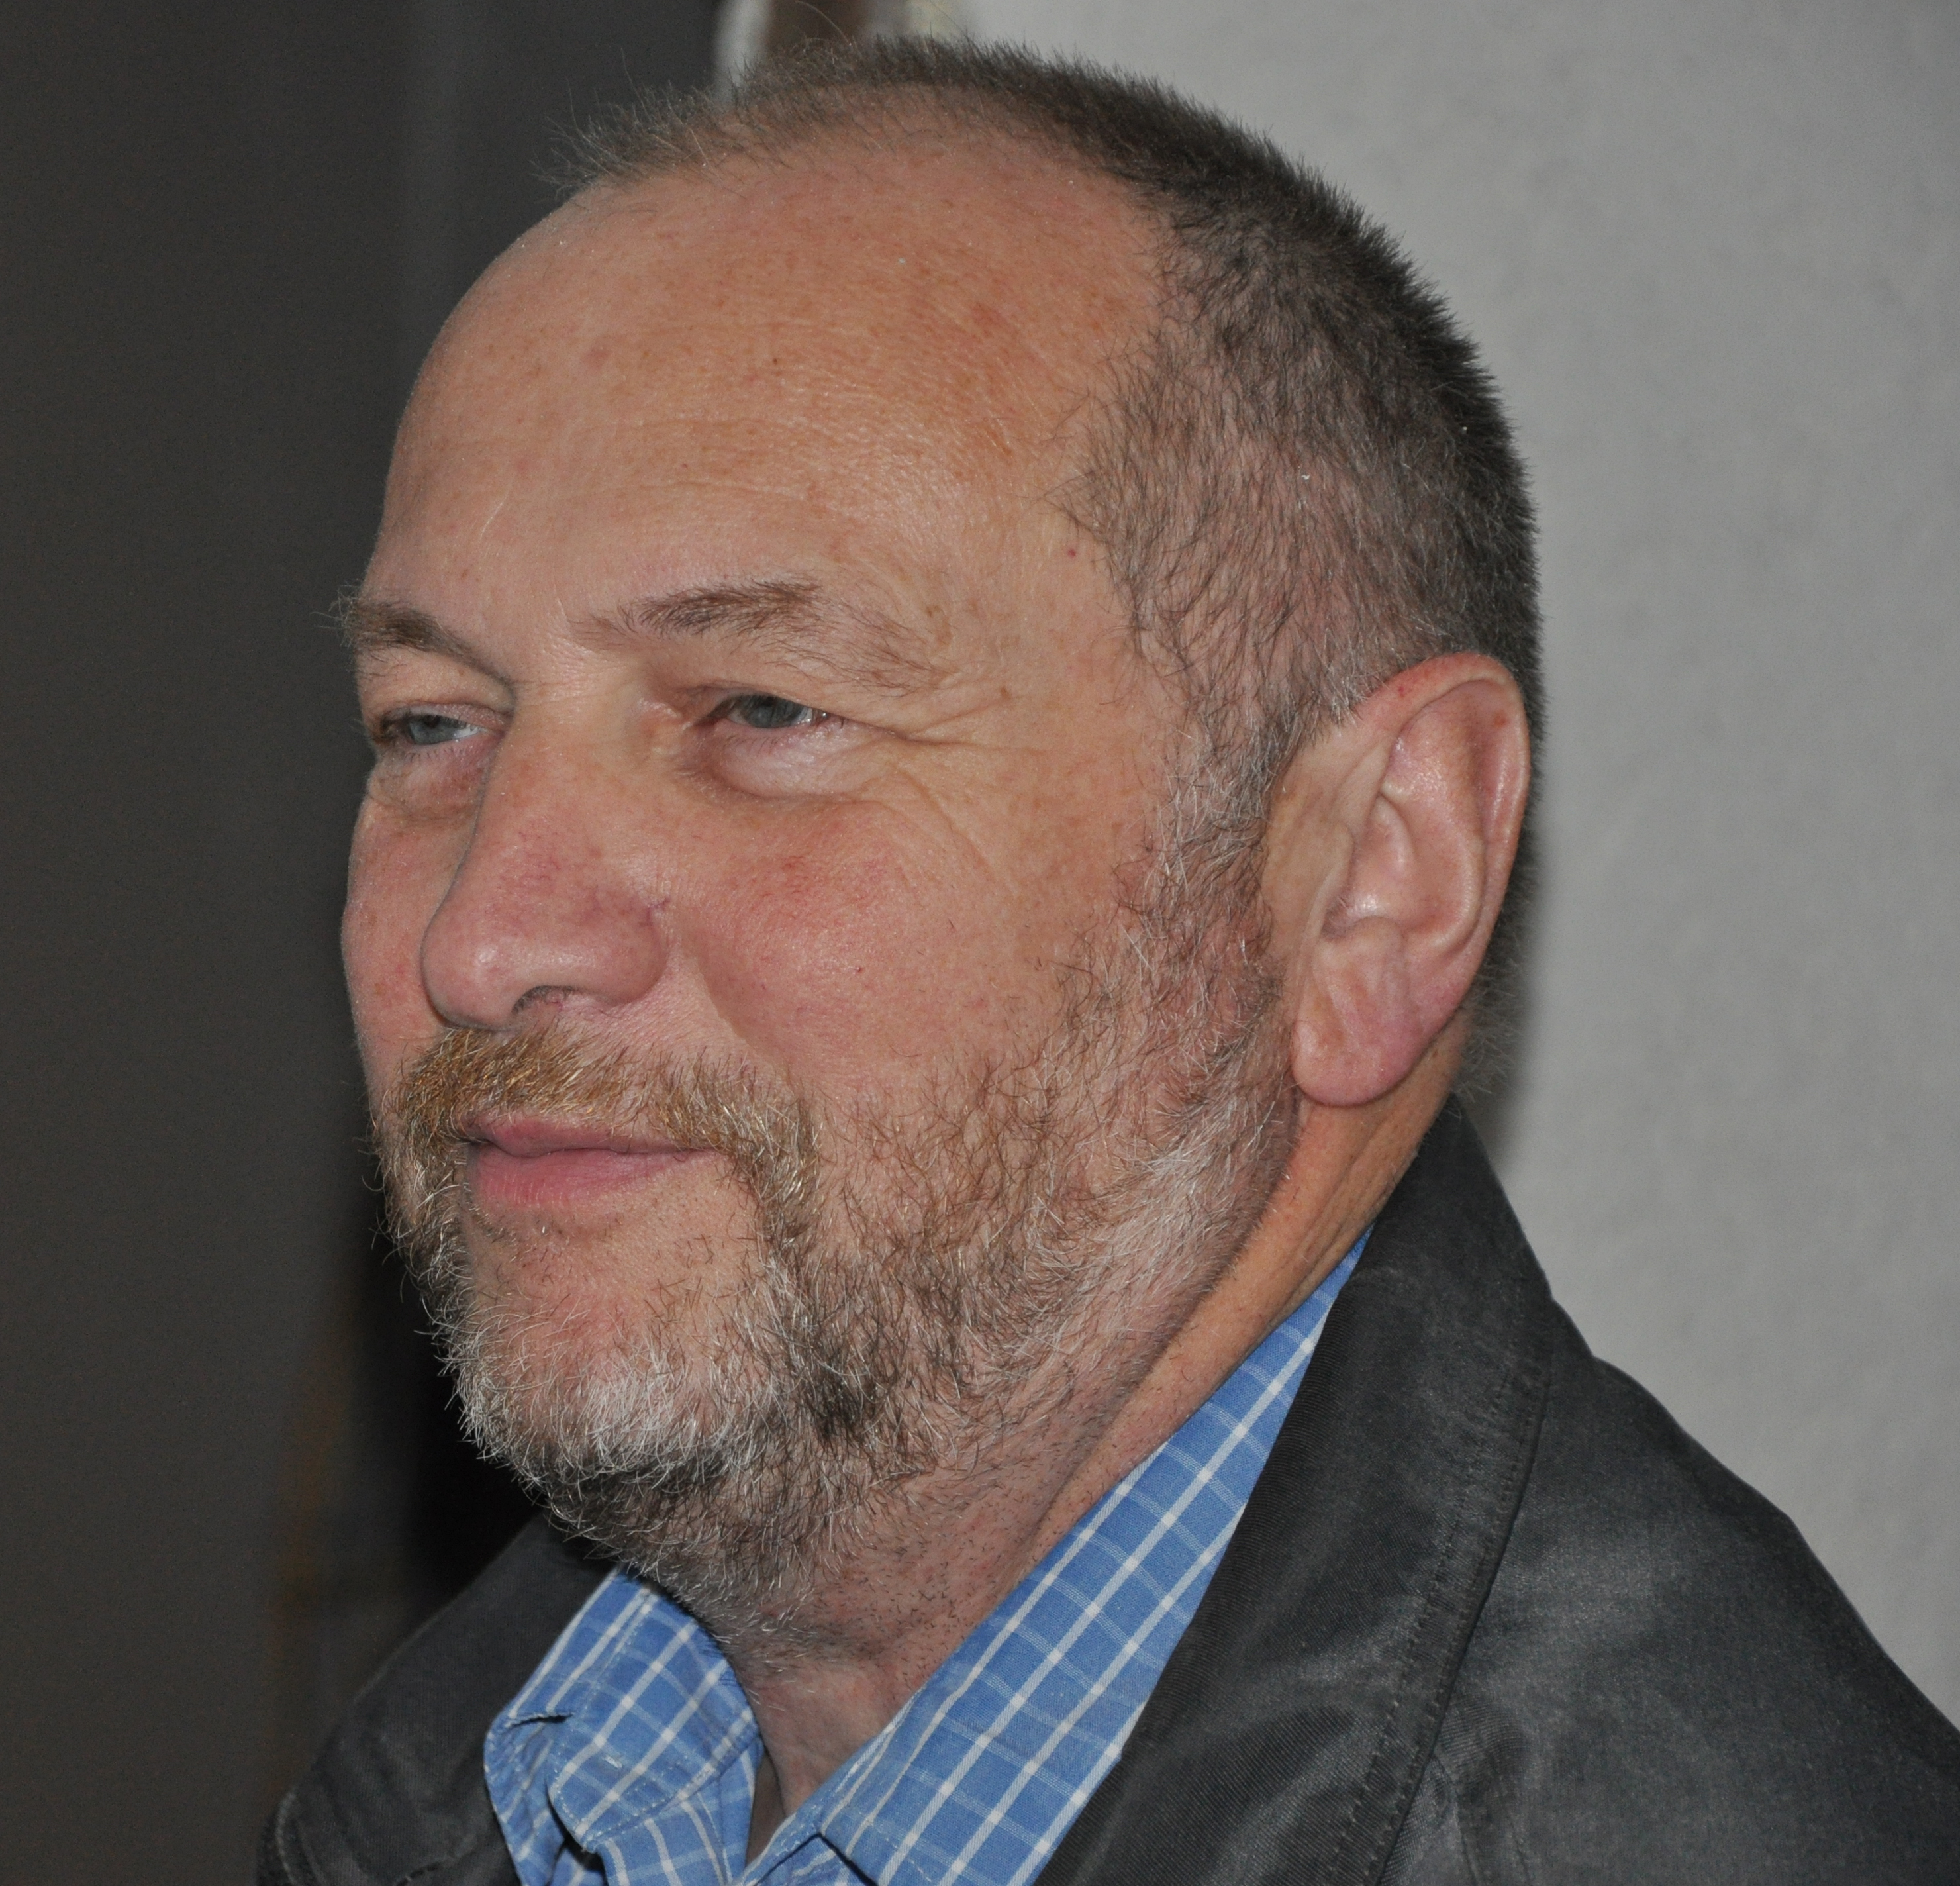 Schmidt Helmut